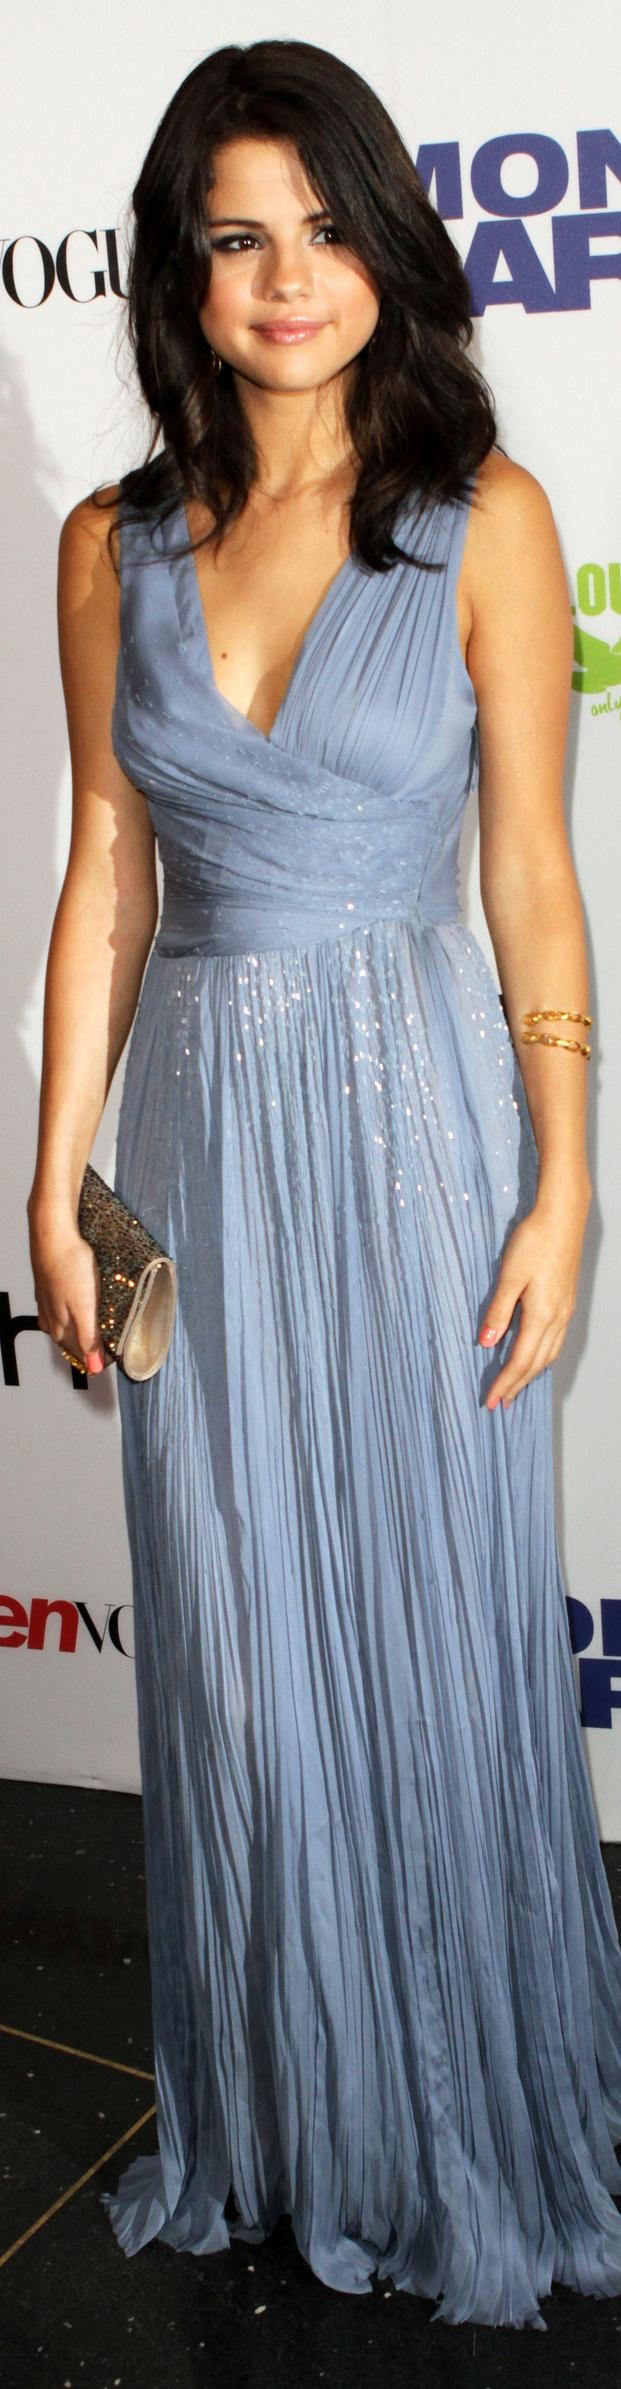 Selena Gomez long dress #blue #formal #elegant